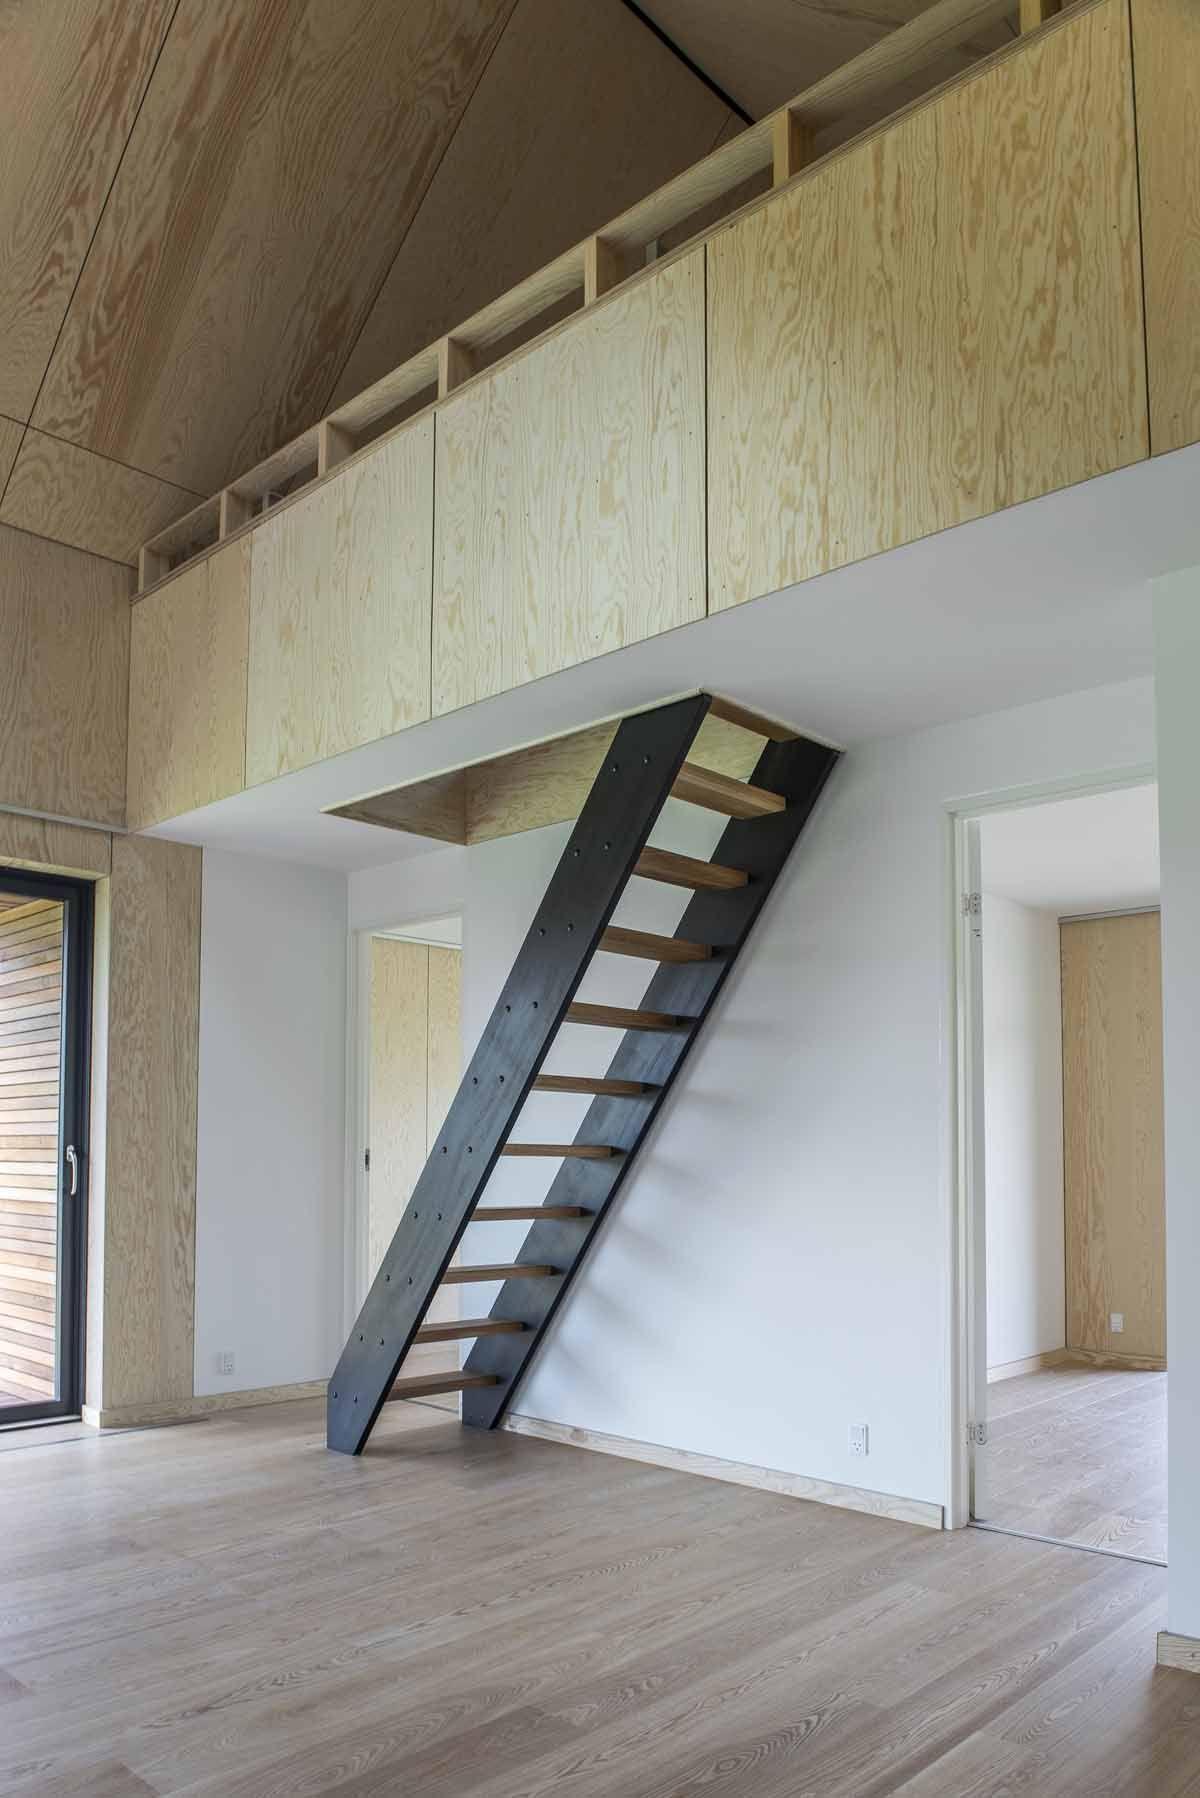 Jesper Ray | Treppe | Pinterest | Treppe, Stiegen und Dachgeschosse